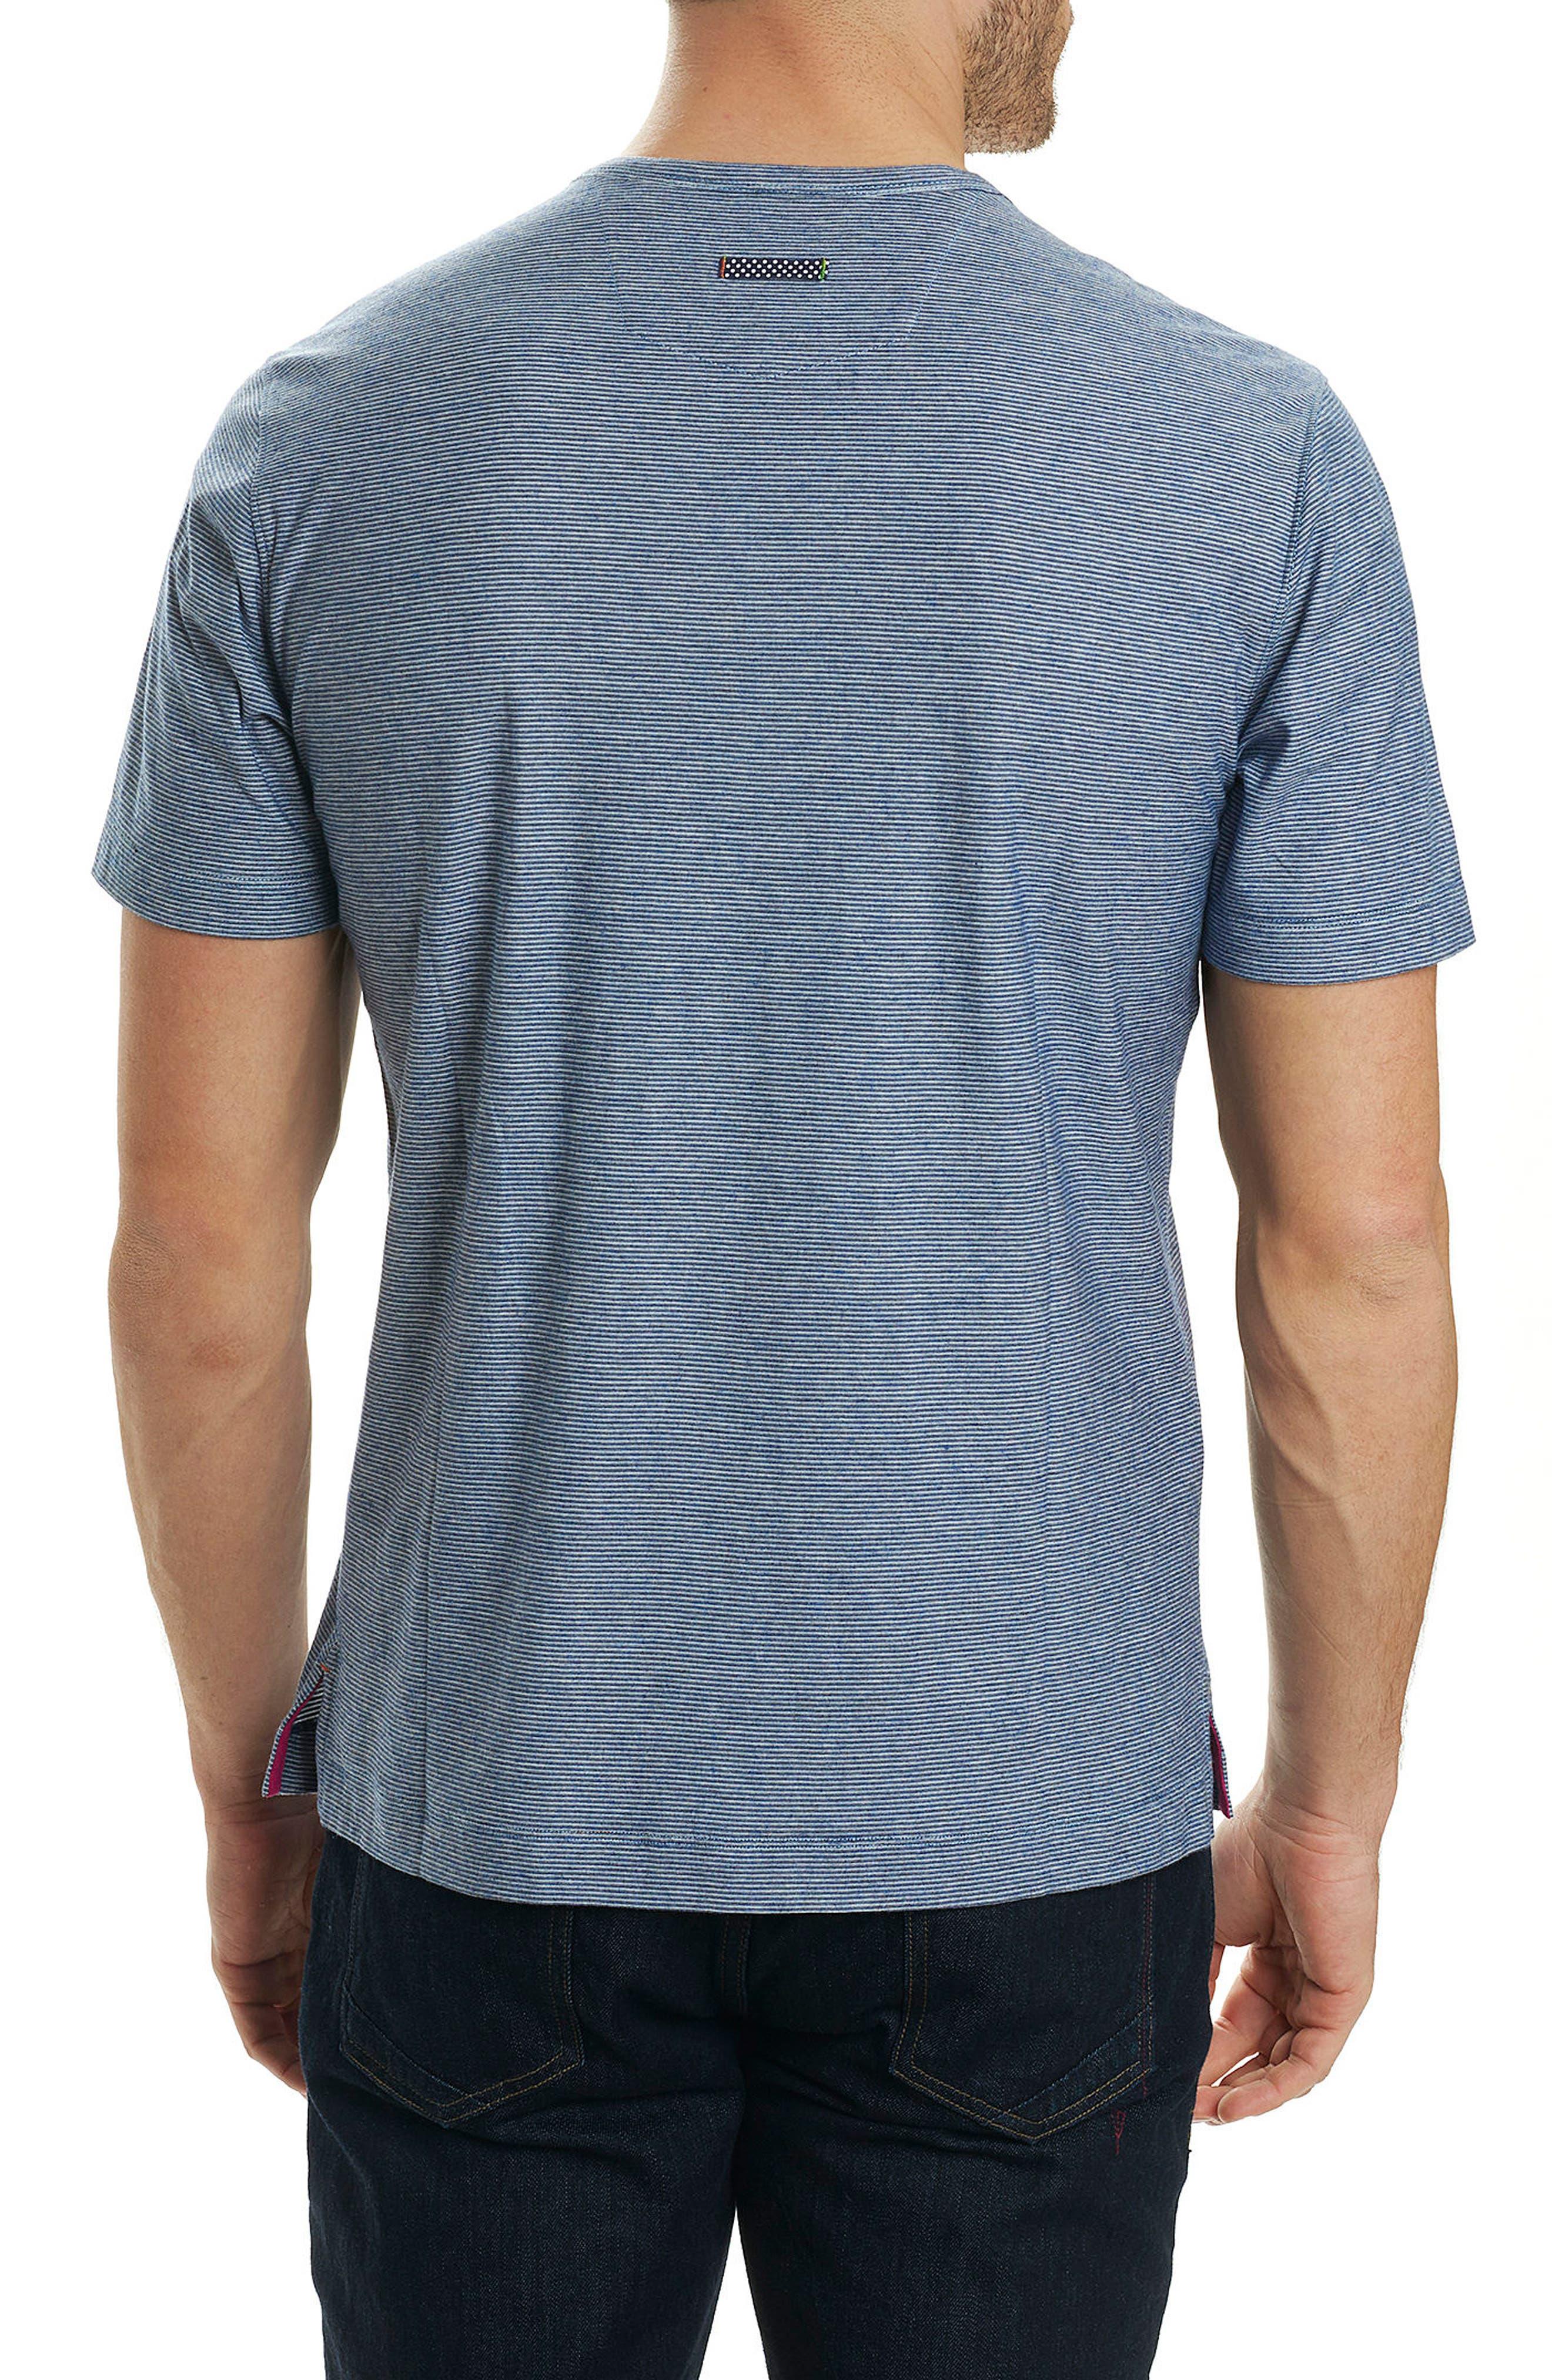 Orchidlands Stripe T-Shirt,                             Alternate thumbnail 2, color,                             Heather Navy